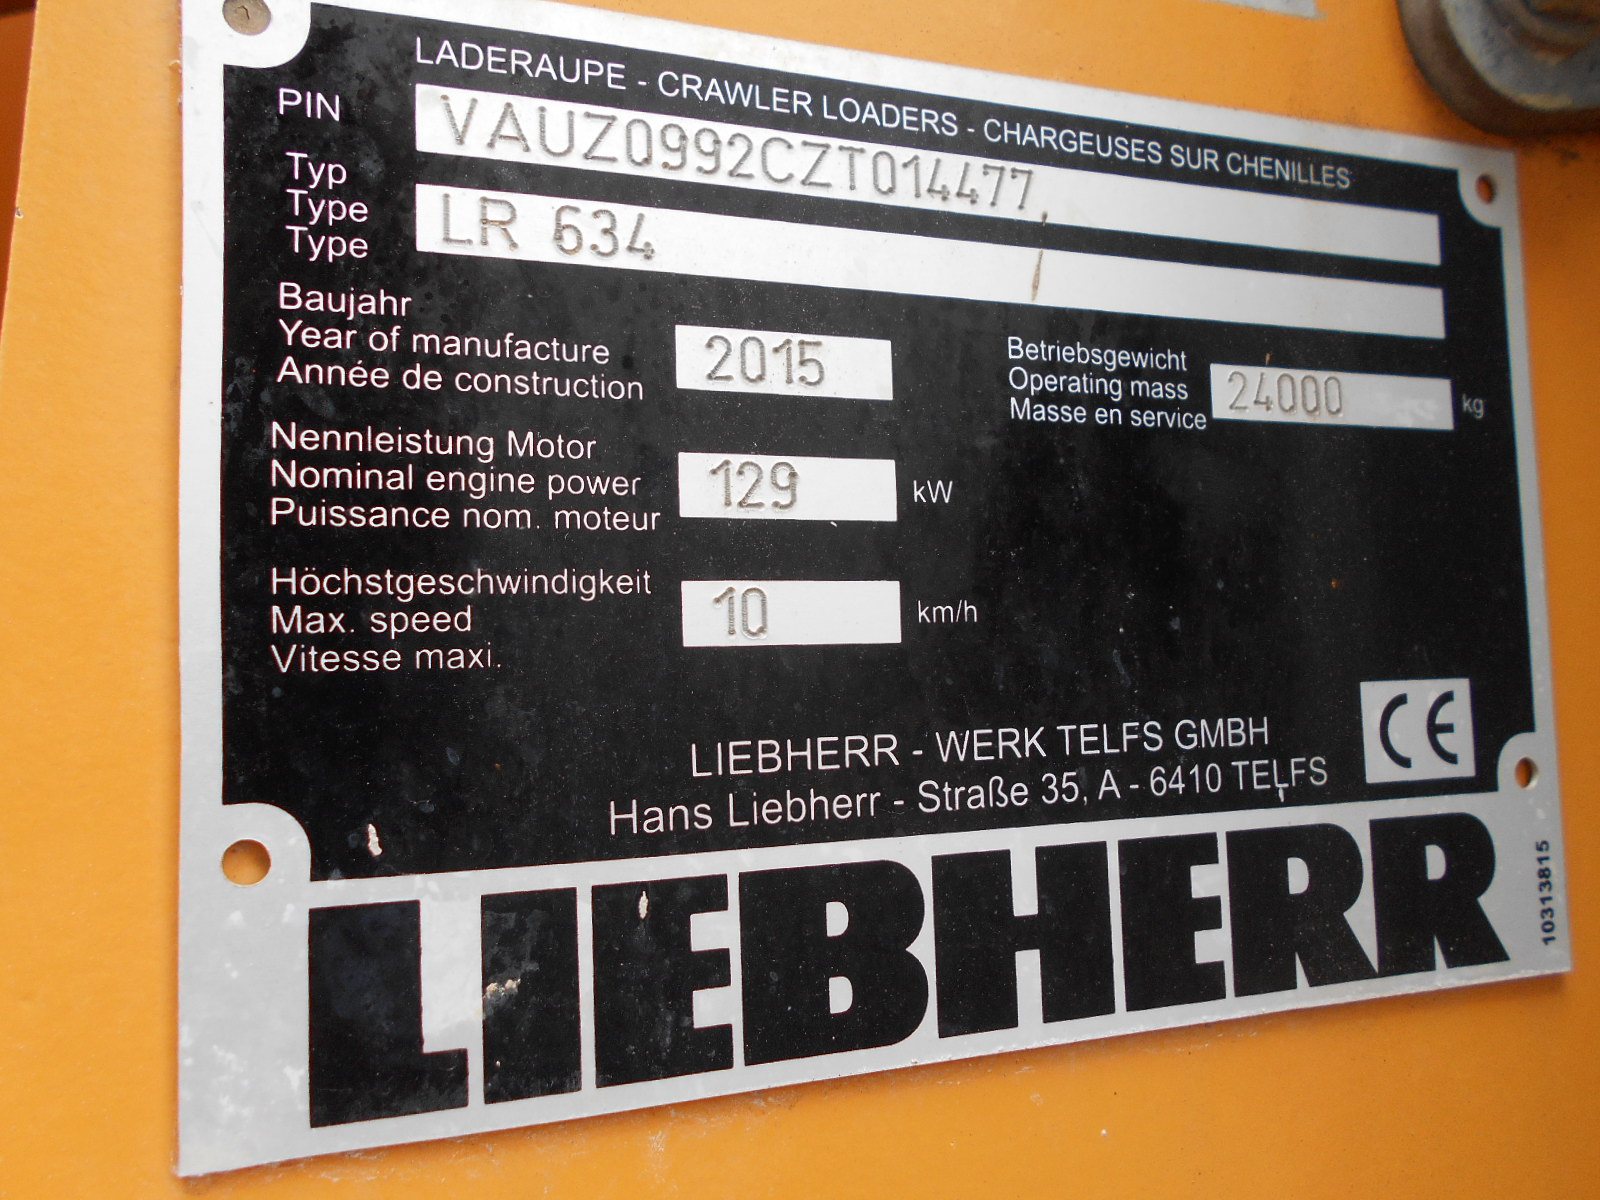 LR634-14477 22.JPG